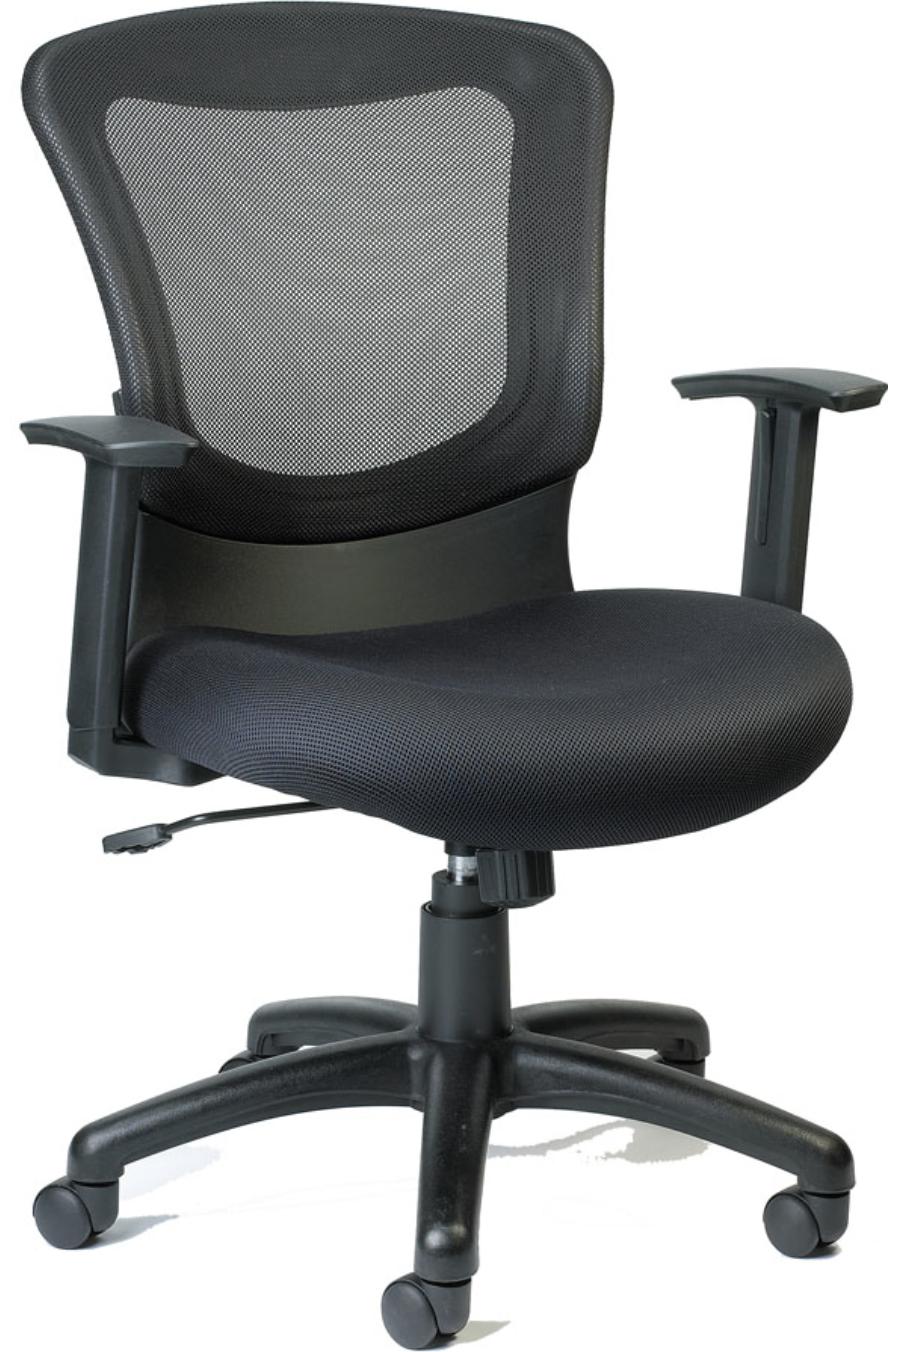 Marlin Series Mesh Chair by Eurotech